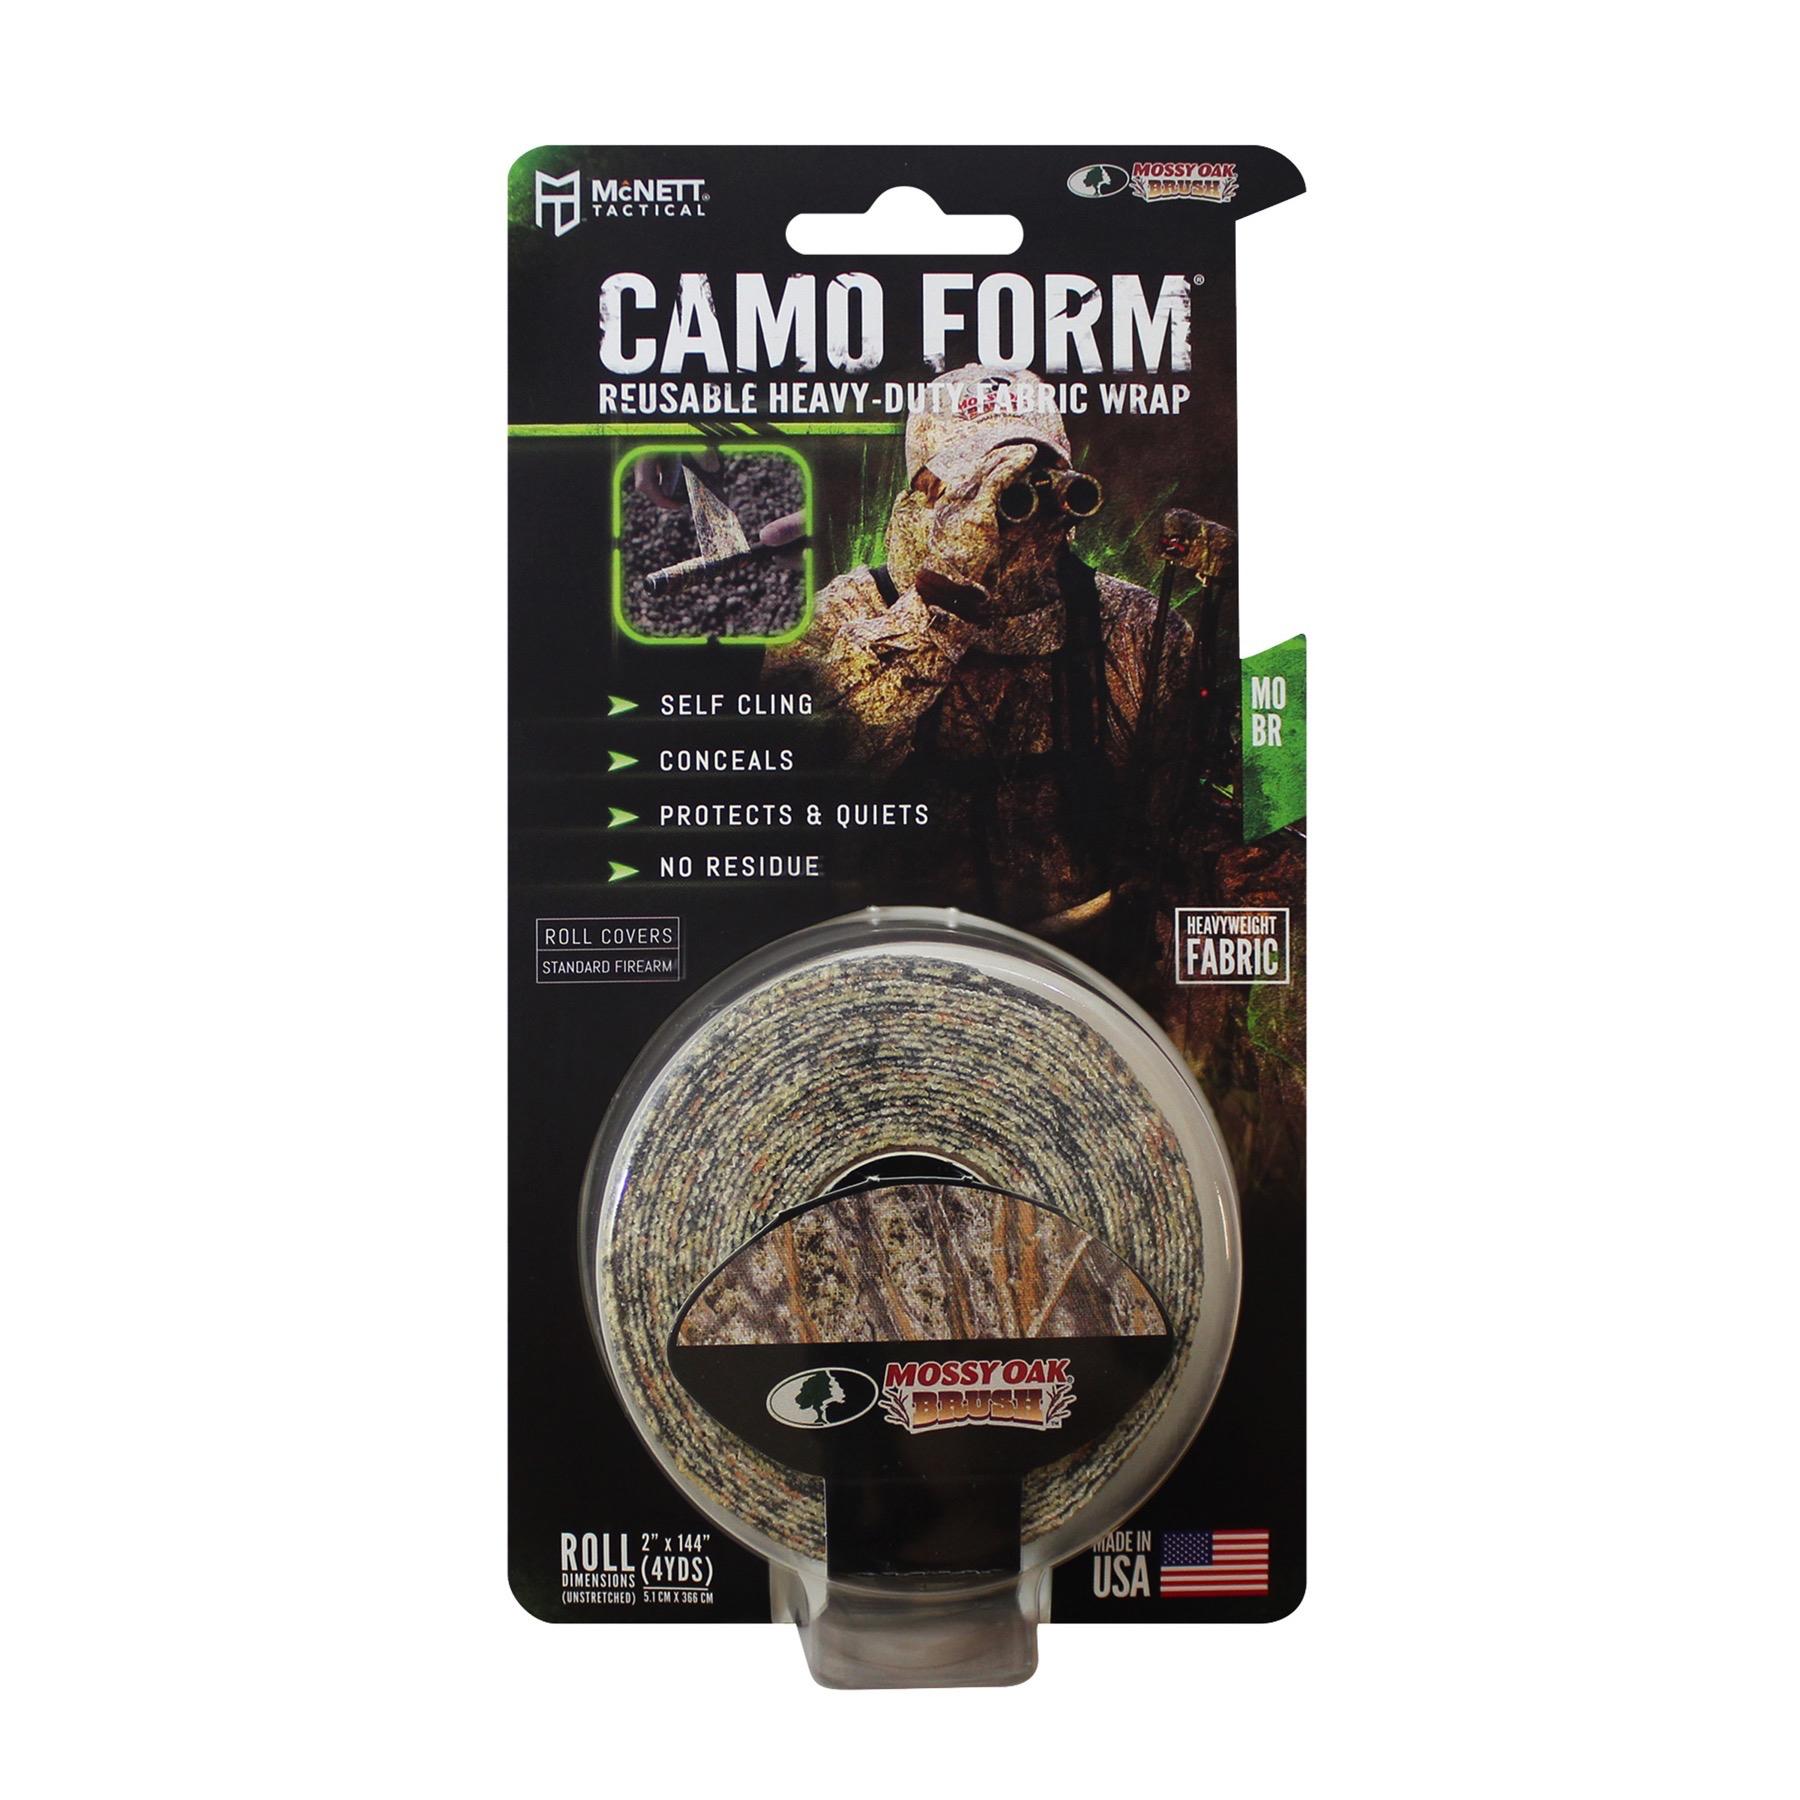 "Camo Form I Self Cling Fabric Wrap I Mossy Oak Grass Pattern I  2/"" x 4 Yd"